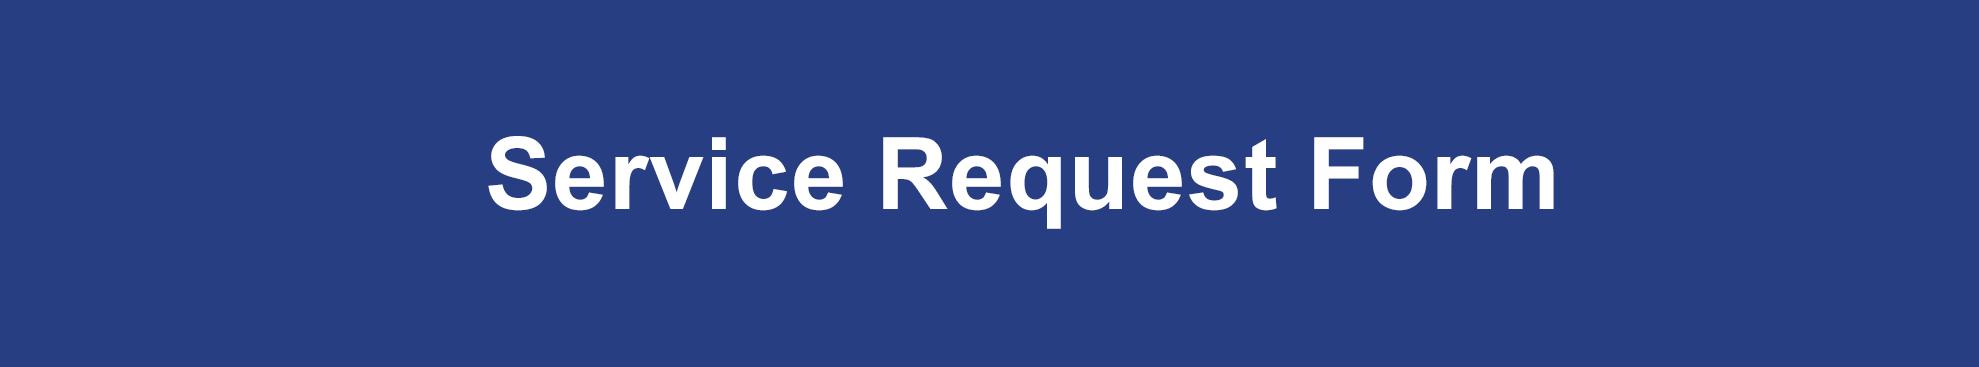 http://northeastheatcool.com.au/wp-content/uploads/2020/06/Service-Request.png